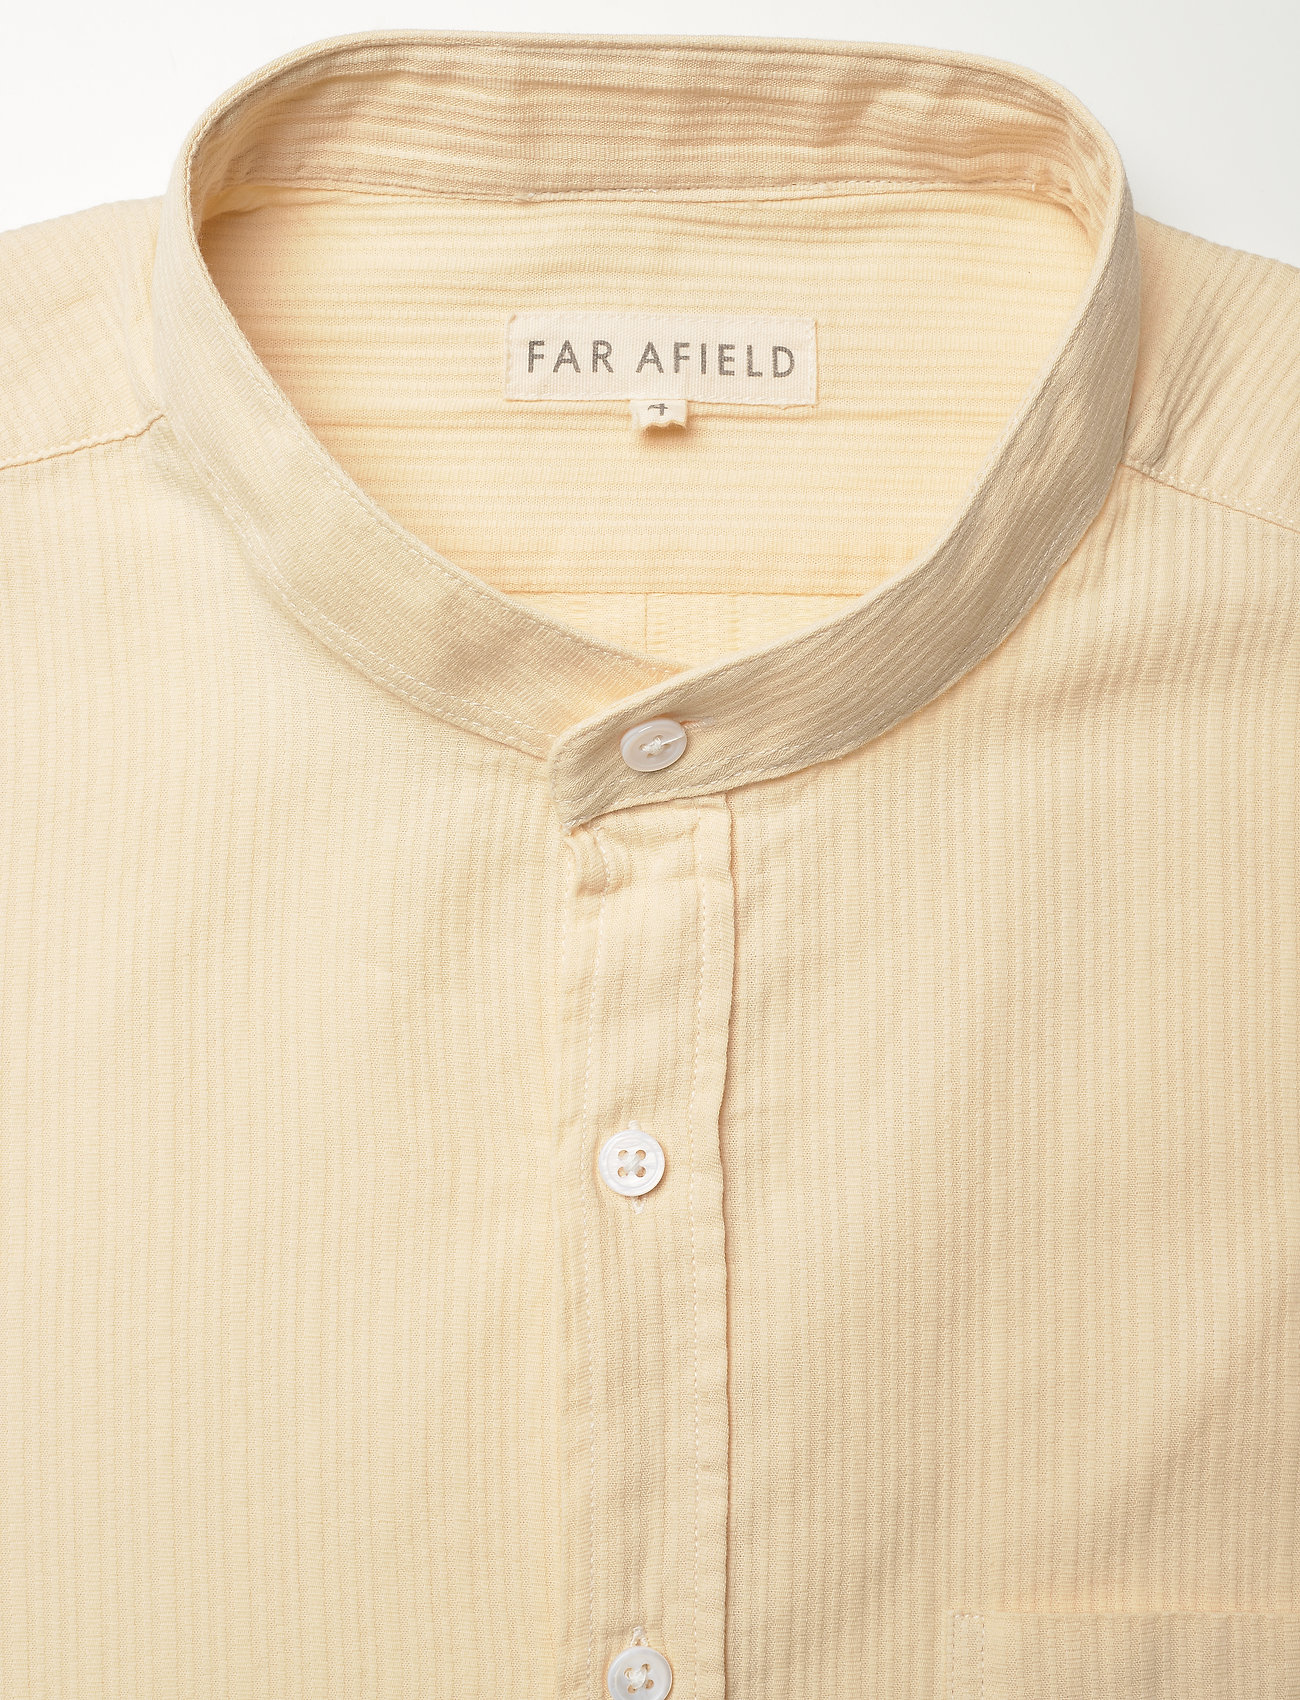 Far Afield - Twombly L/S Shirt - Textured Stripe - koszule lniane - lw - 2